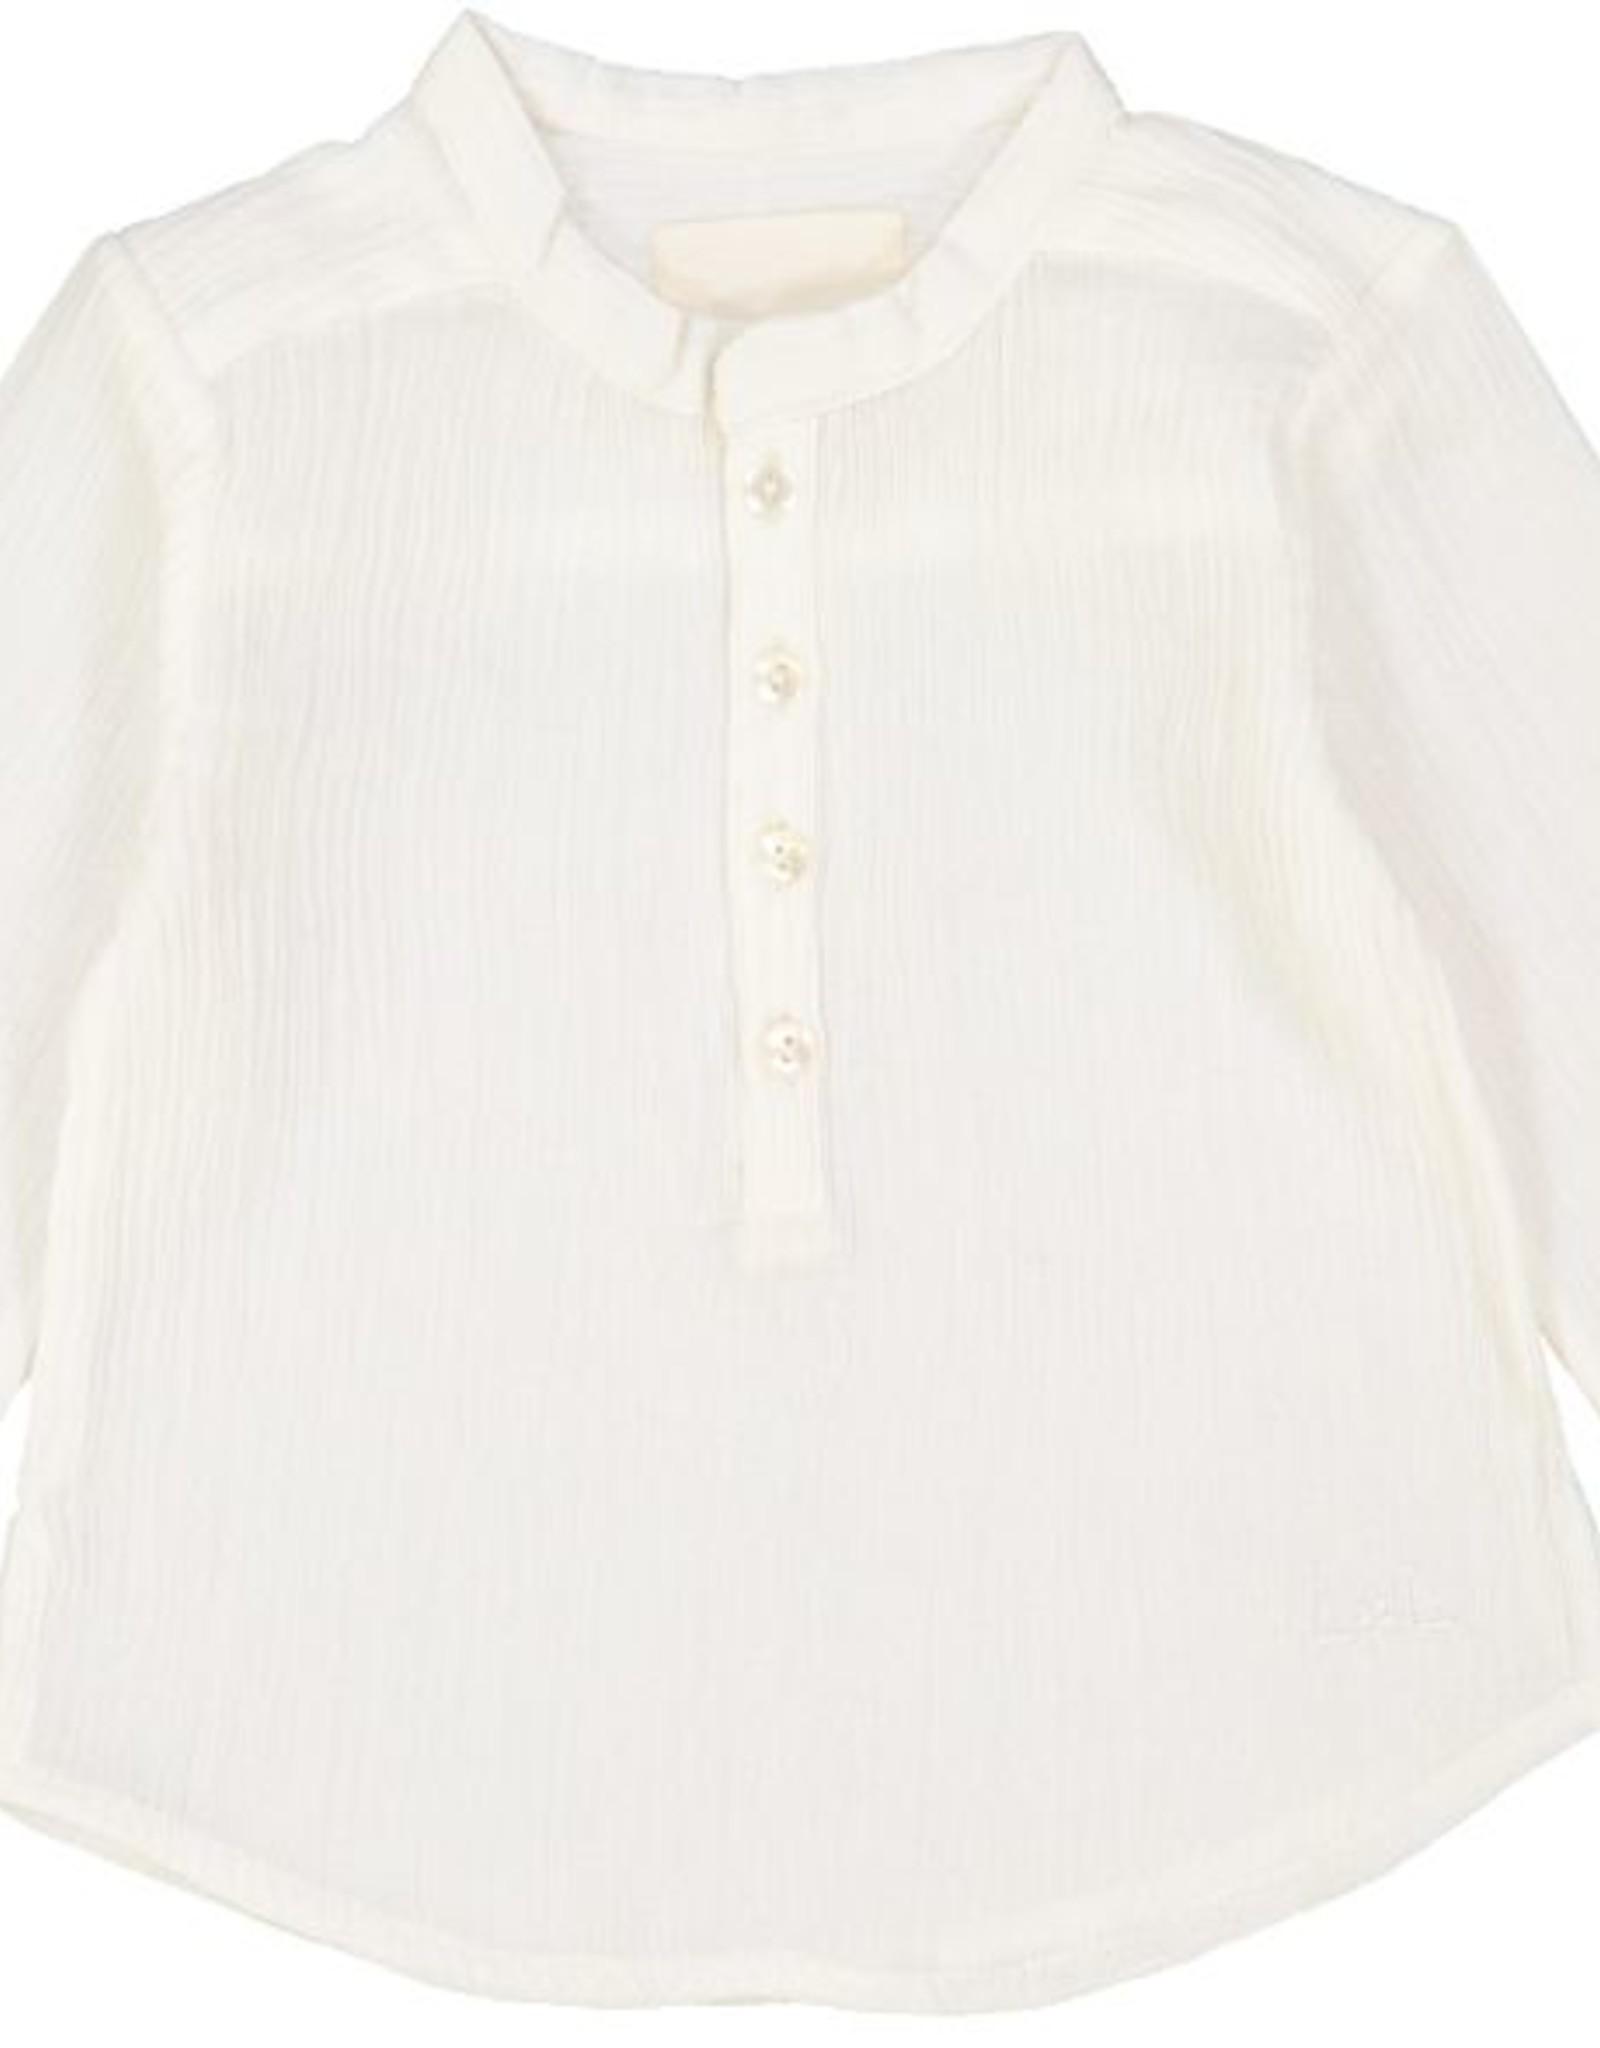 Louis Louise Grand père shirt